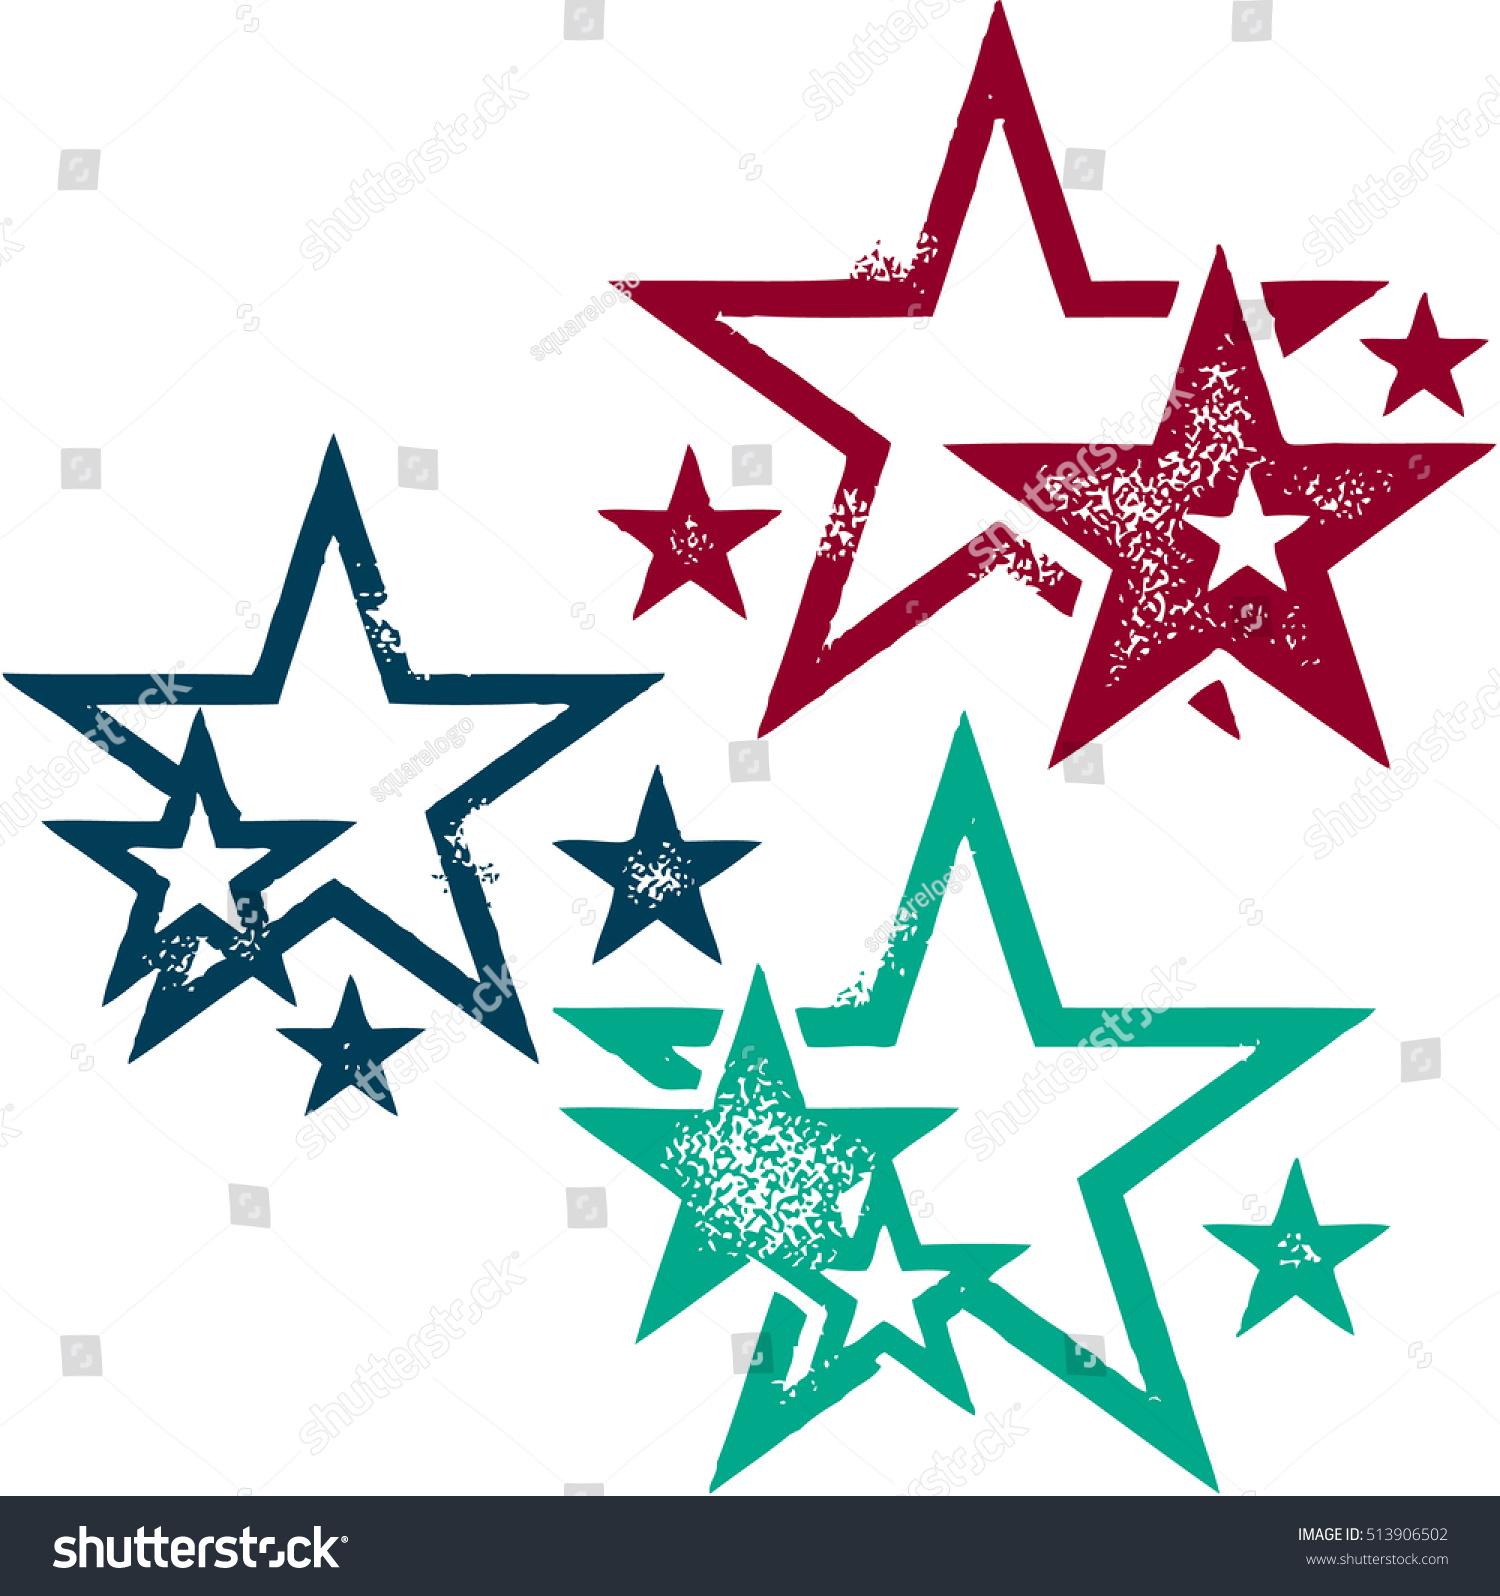 Grunge vector star designs stock vector 513906502 shutterstock grunge vector star designs urmus Gallery